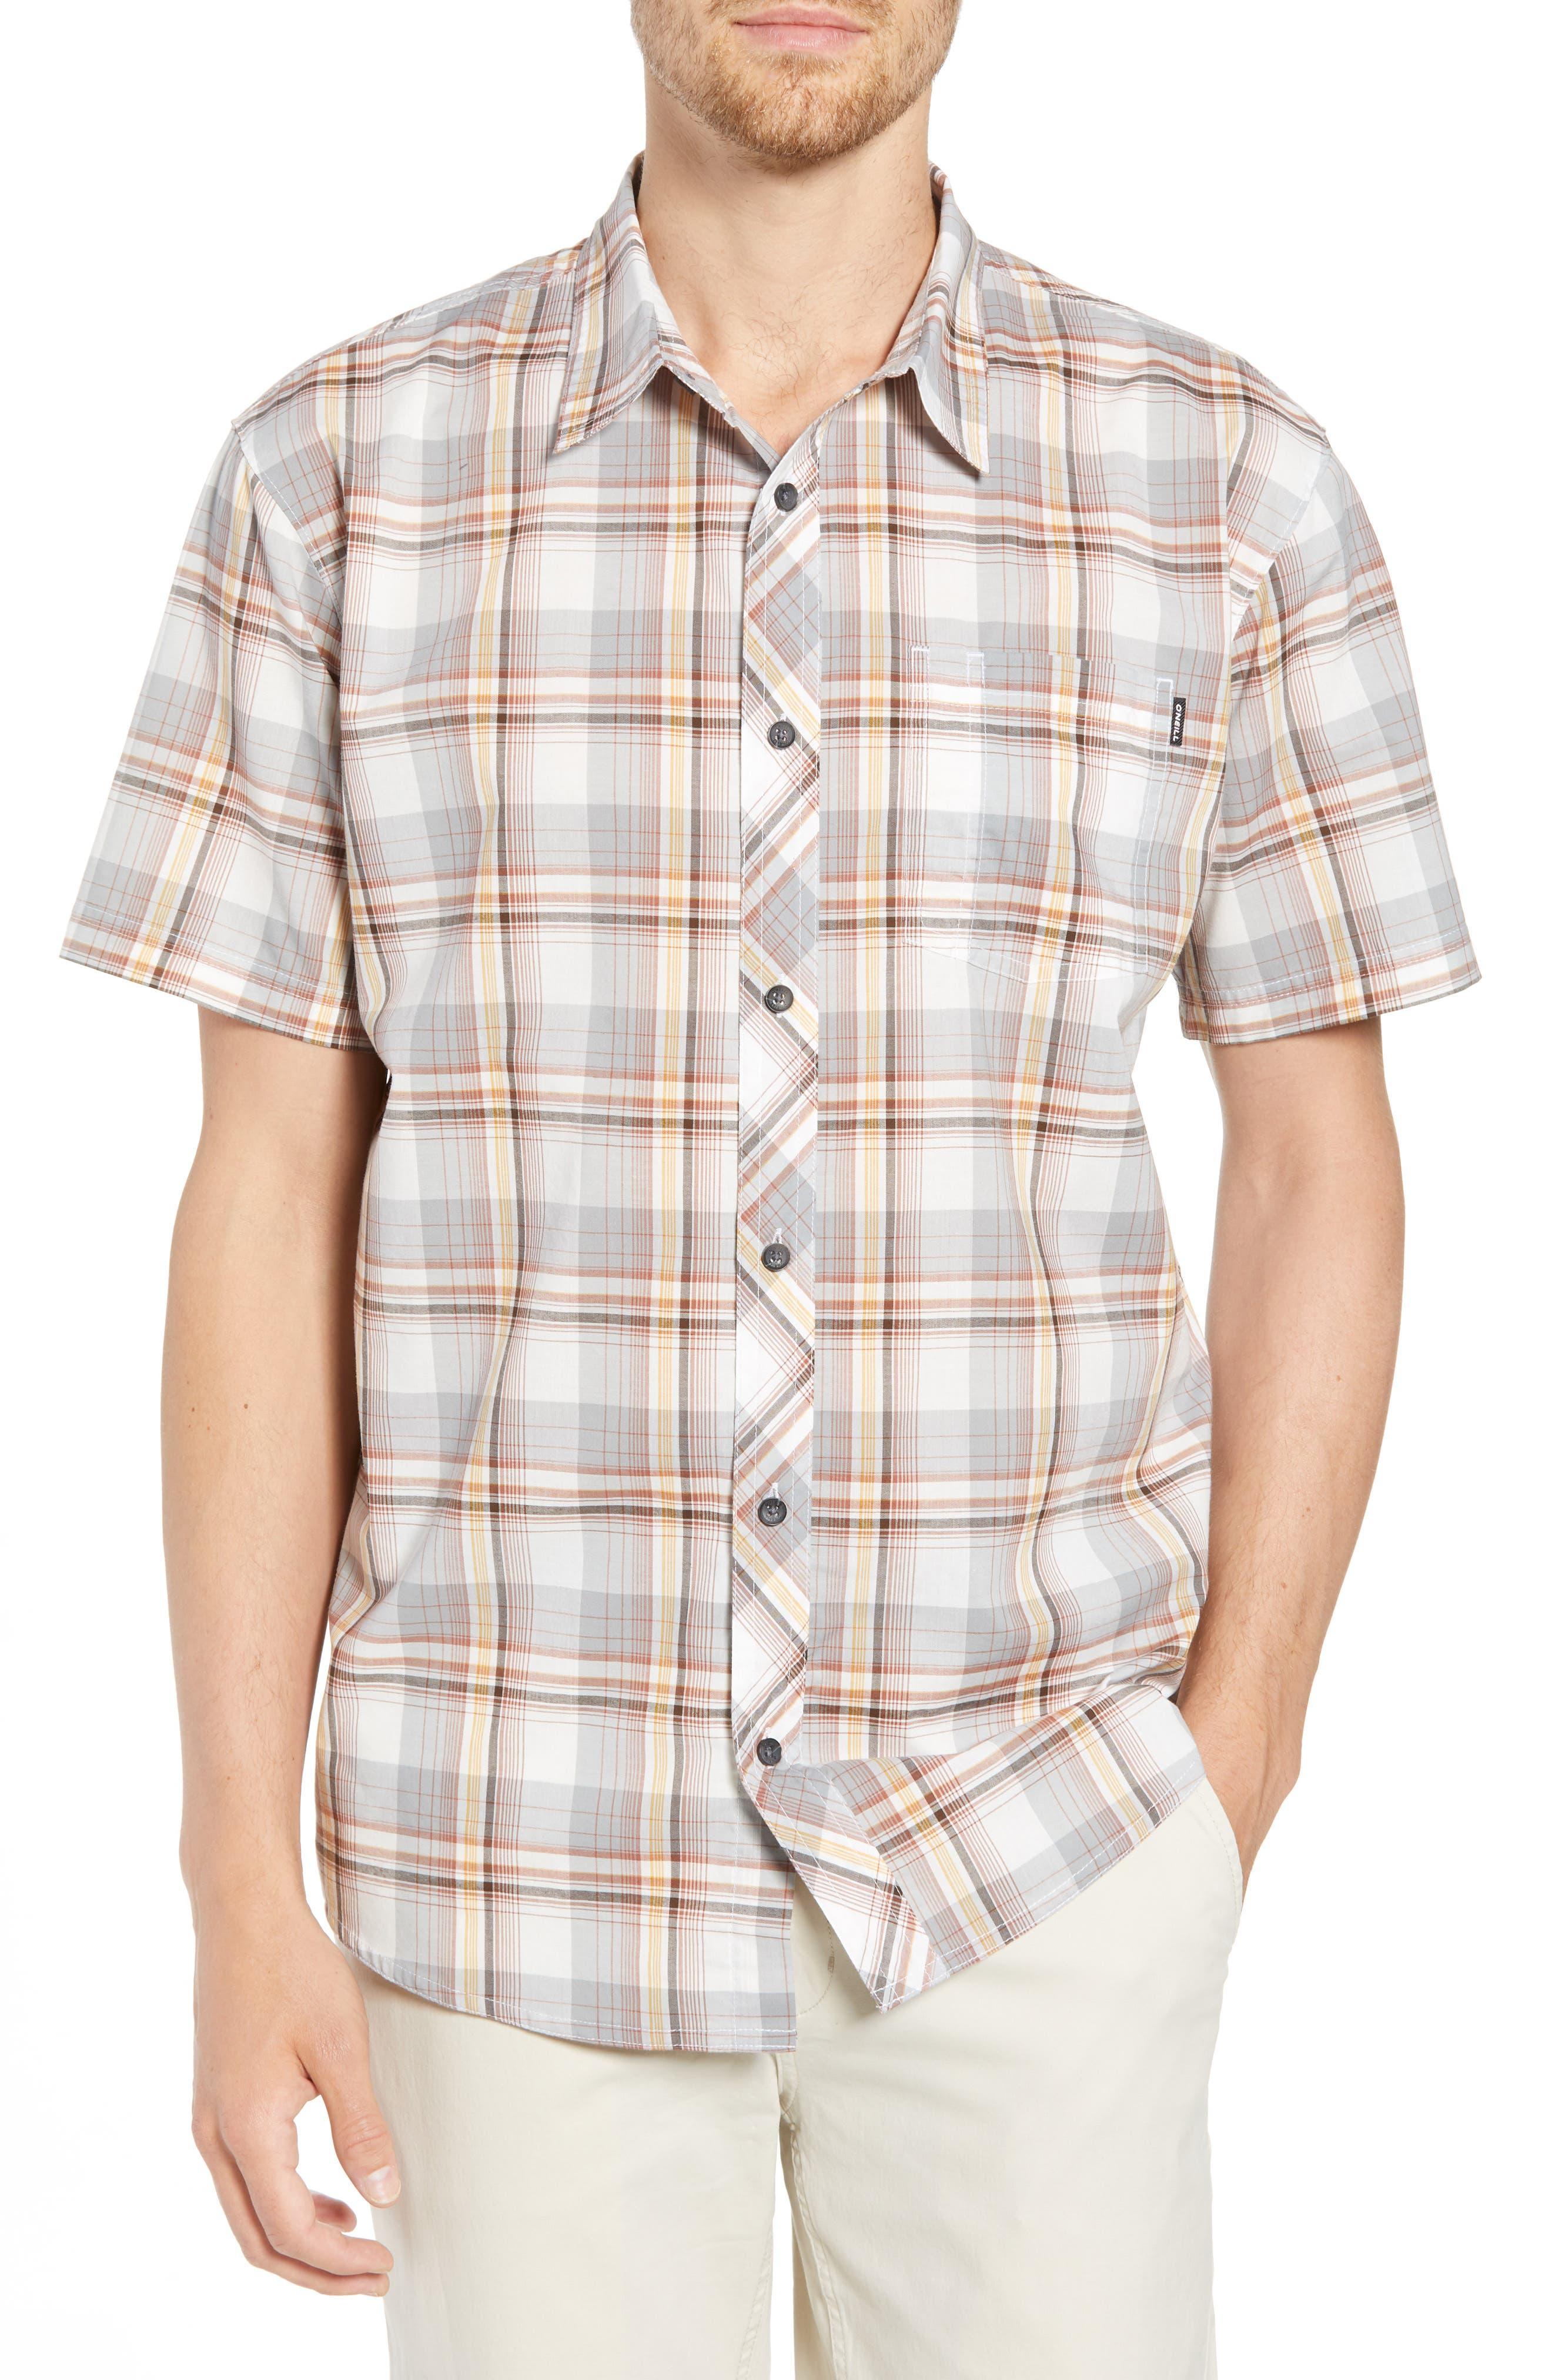 Gentry Short Sleeve Shirt,                         Main,                         color, White